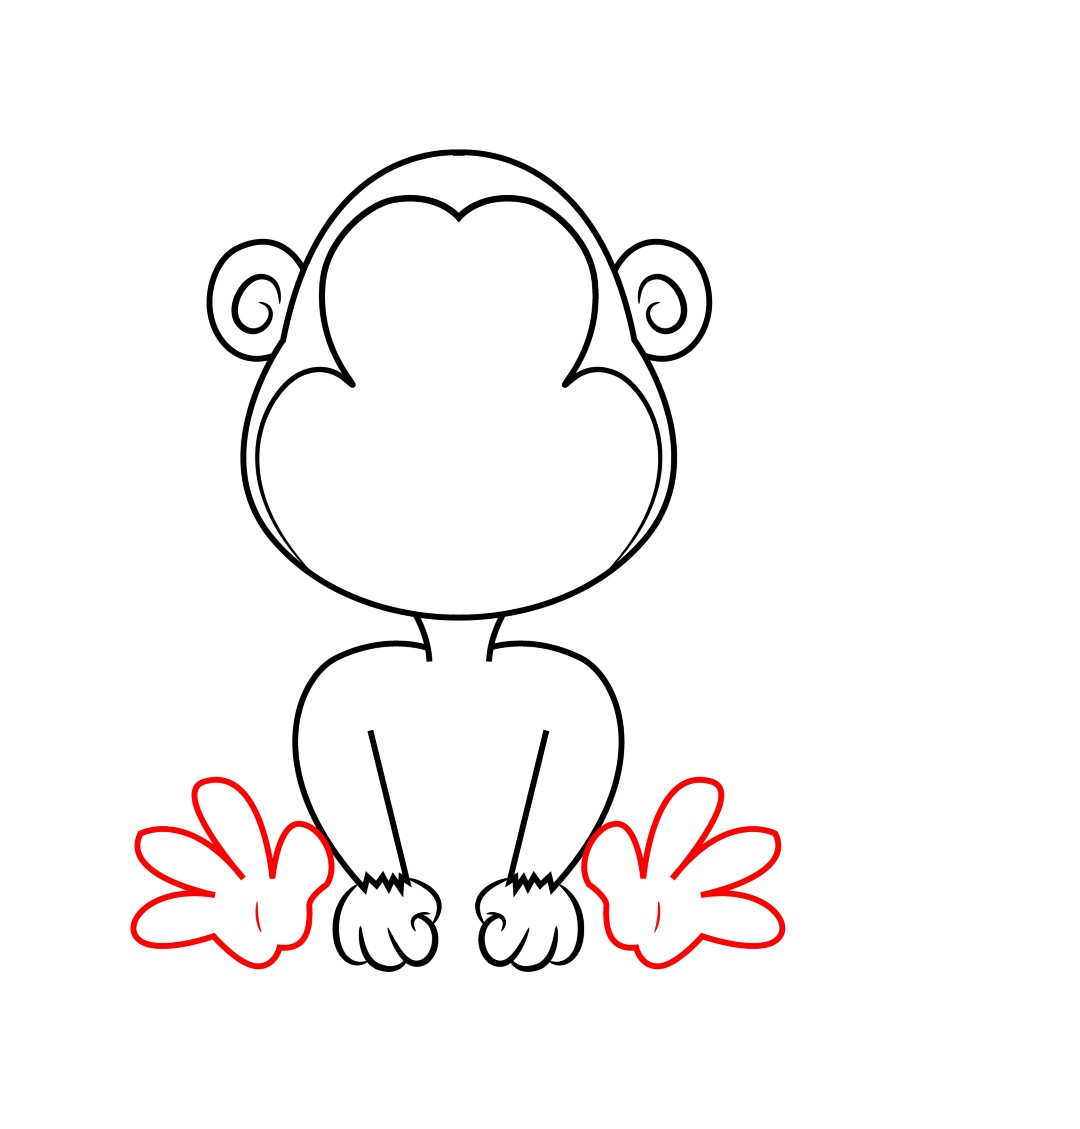 How To Draw A Cartoon Monkey Draw Central